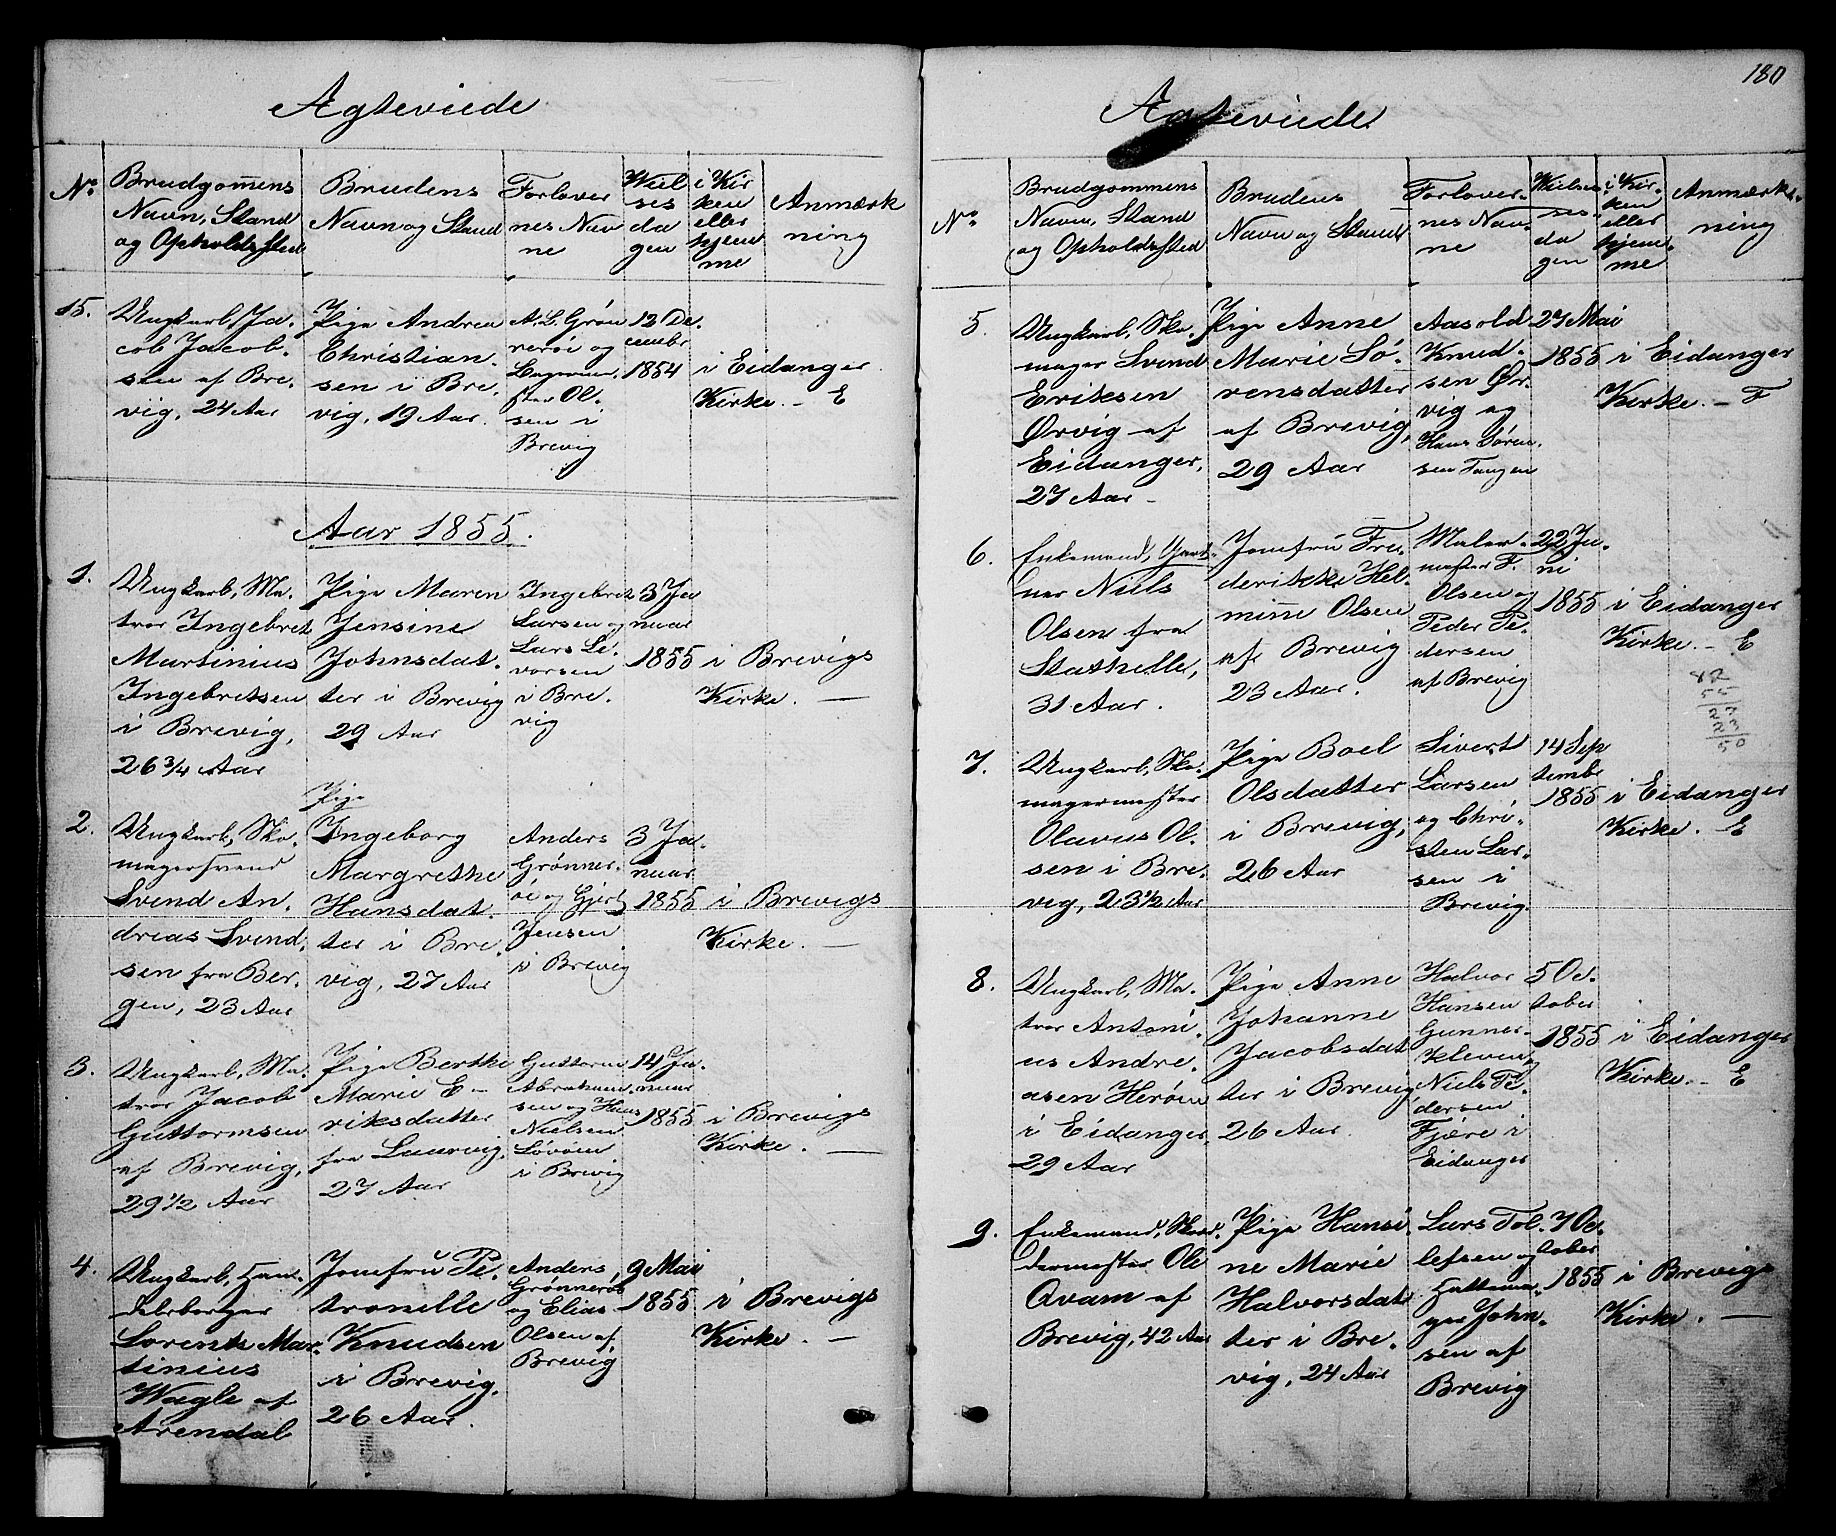 SAKO, Brevik kirkebøker, G/Ga/L0002: Klokkerbok nr. 2, 1846-1865, s. 180